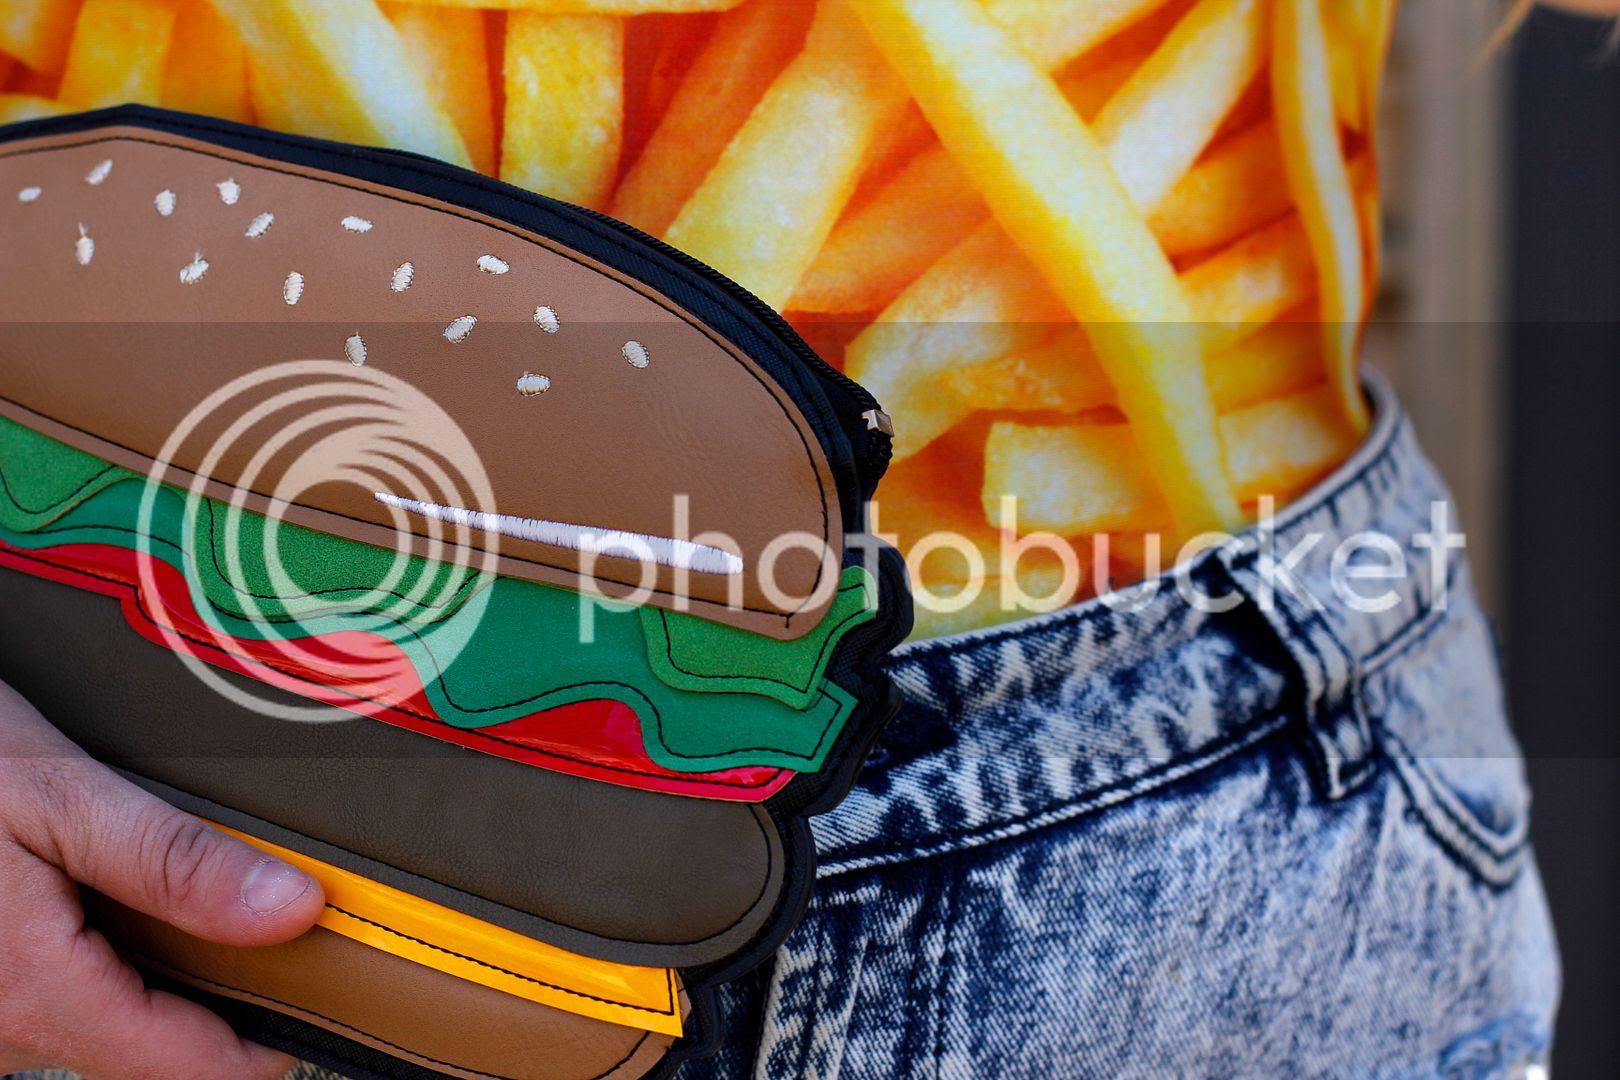 plus size fashion swimsuit bodysuit love this sunday french fries bodysuit